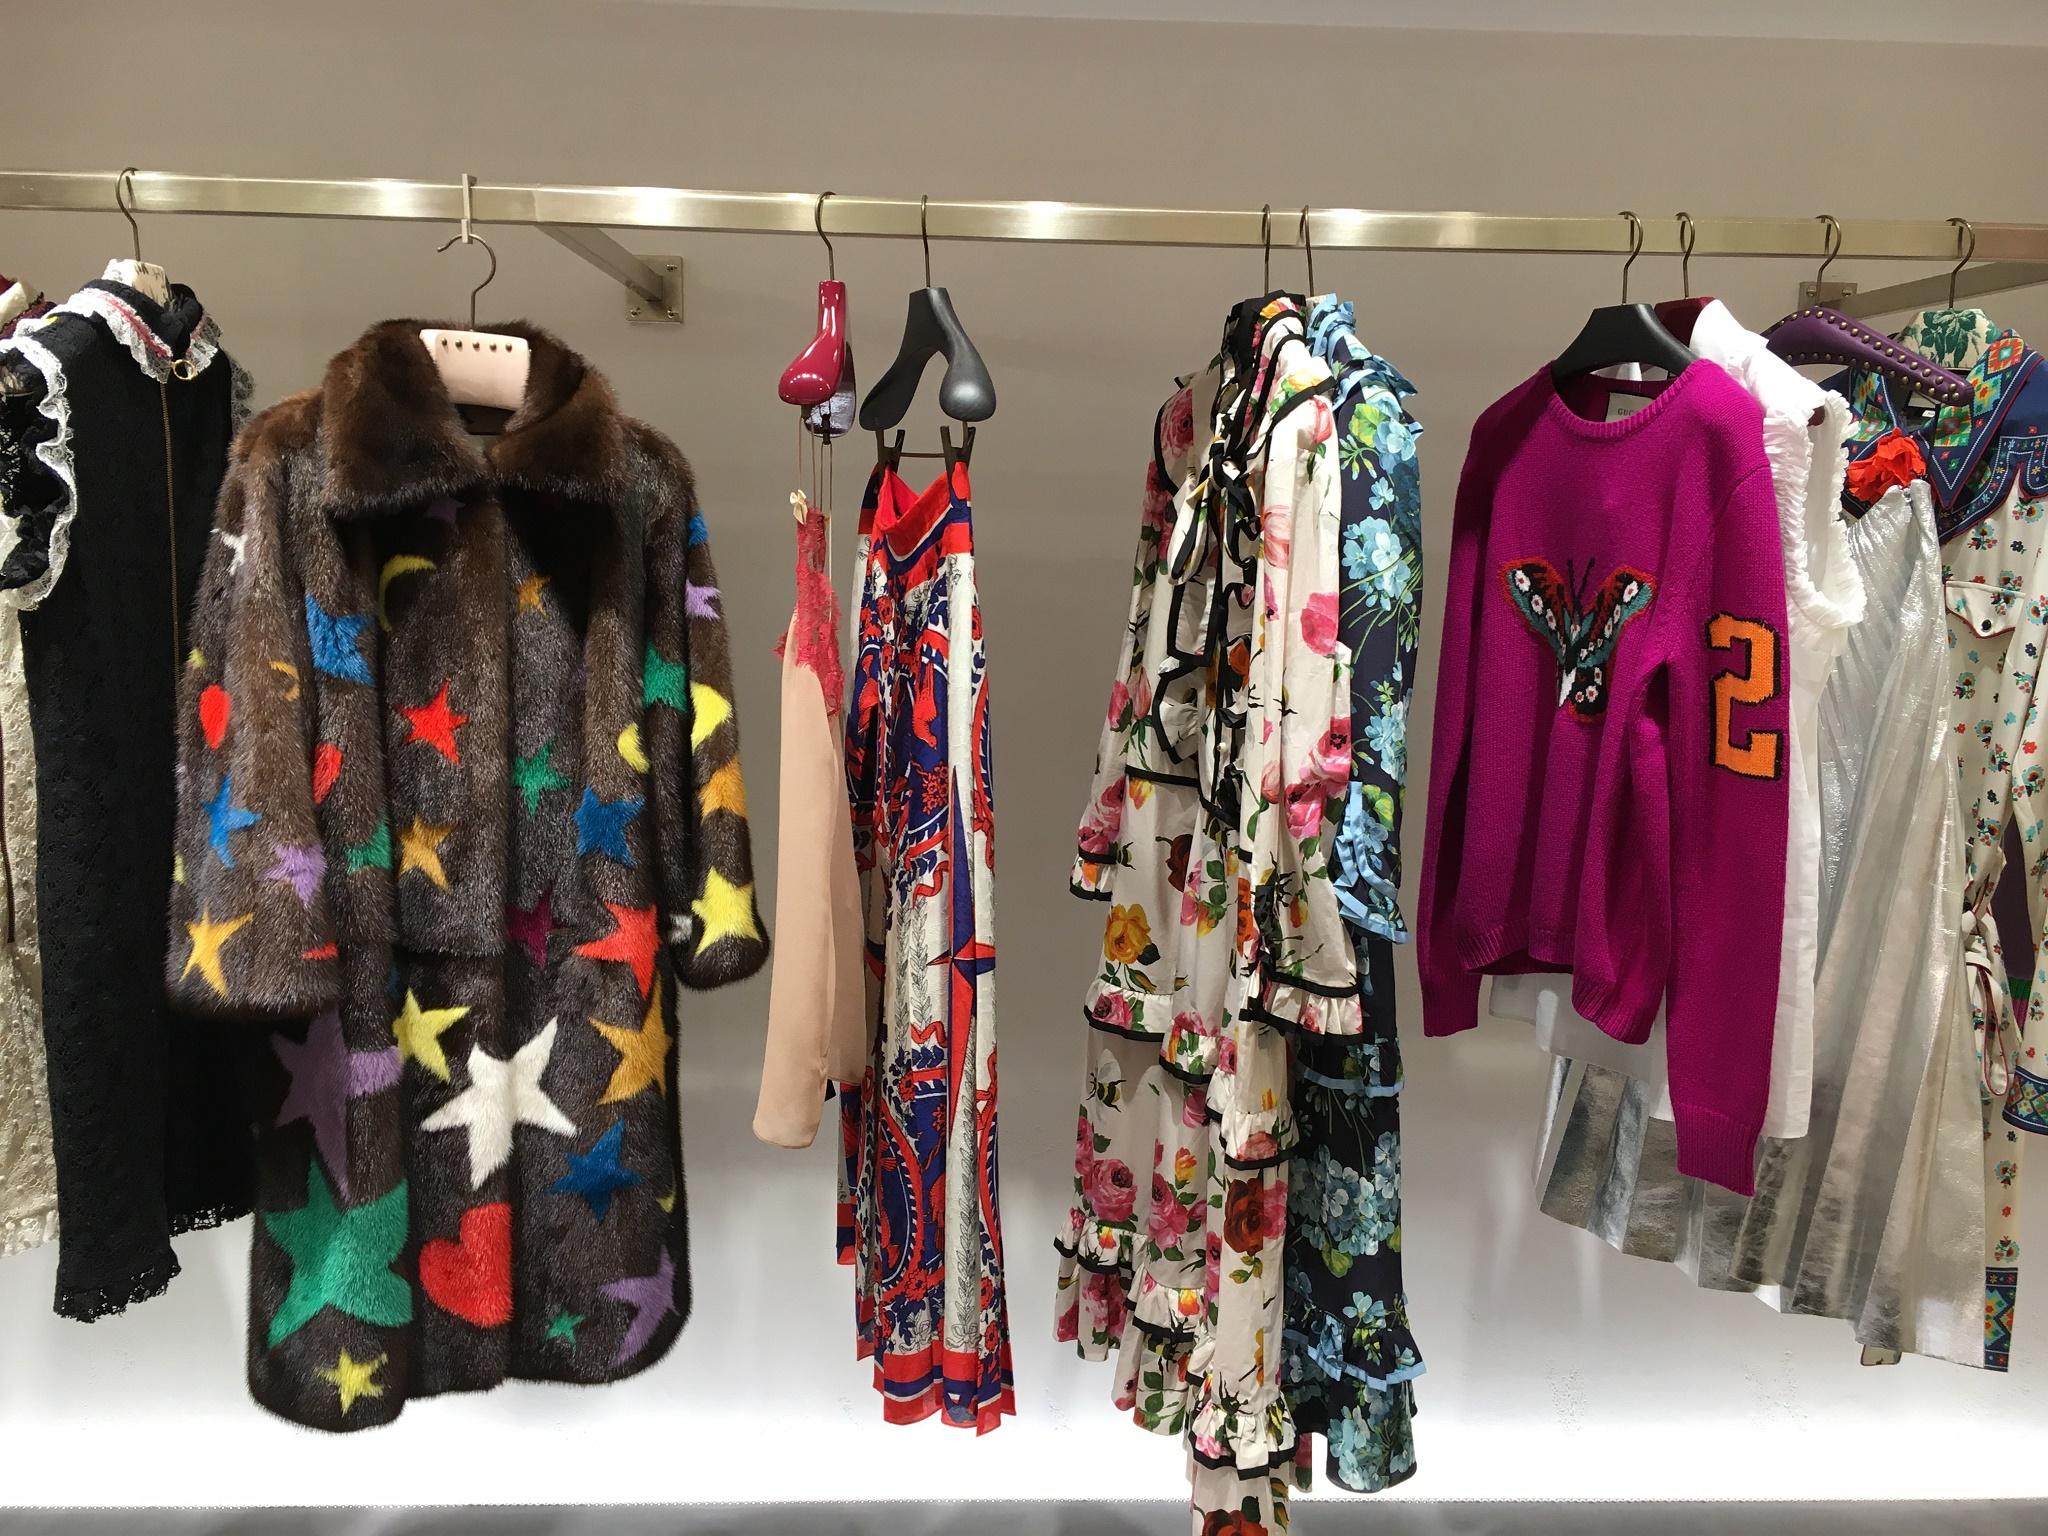 Gucci Kollektion, Gucci collection, Gucci Mailand, Gucci milano, Modebloggerin, Fashionblogger, Lieblingsstil